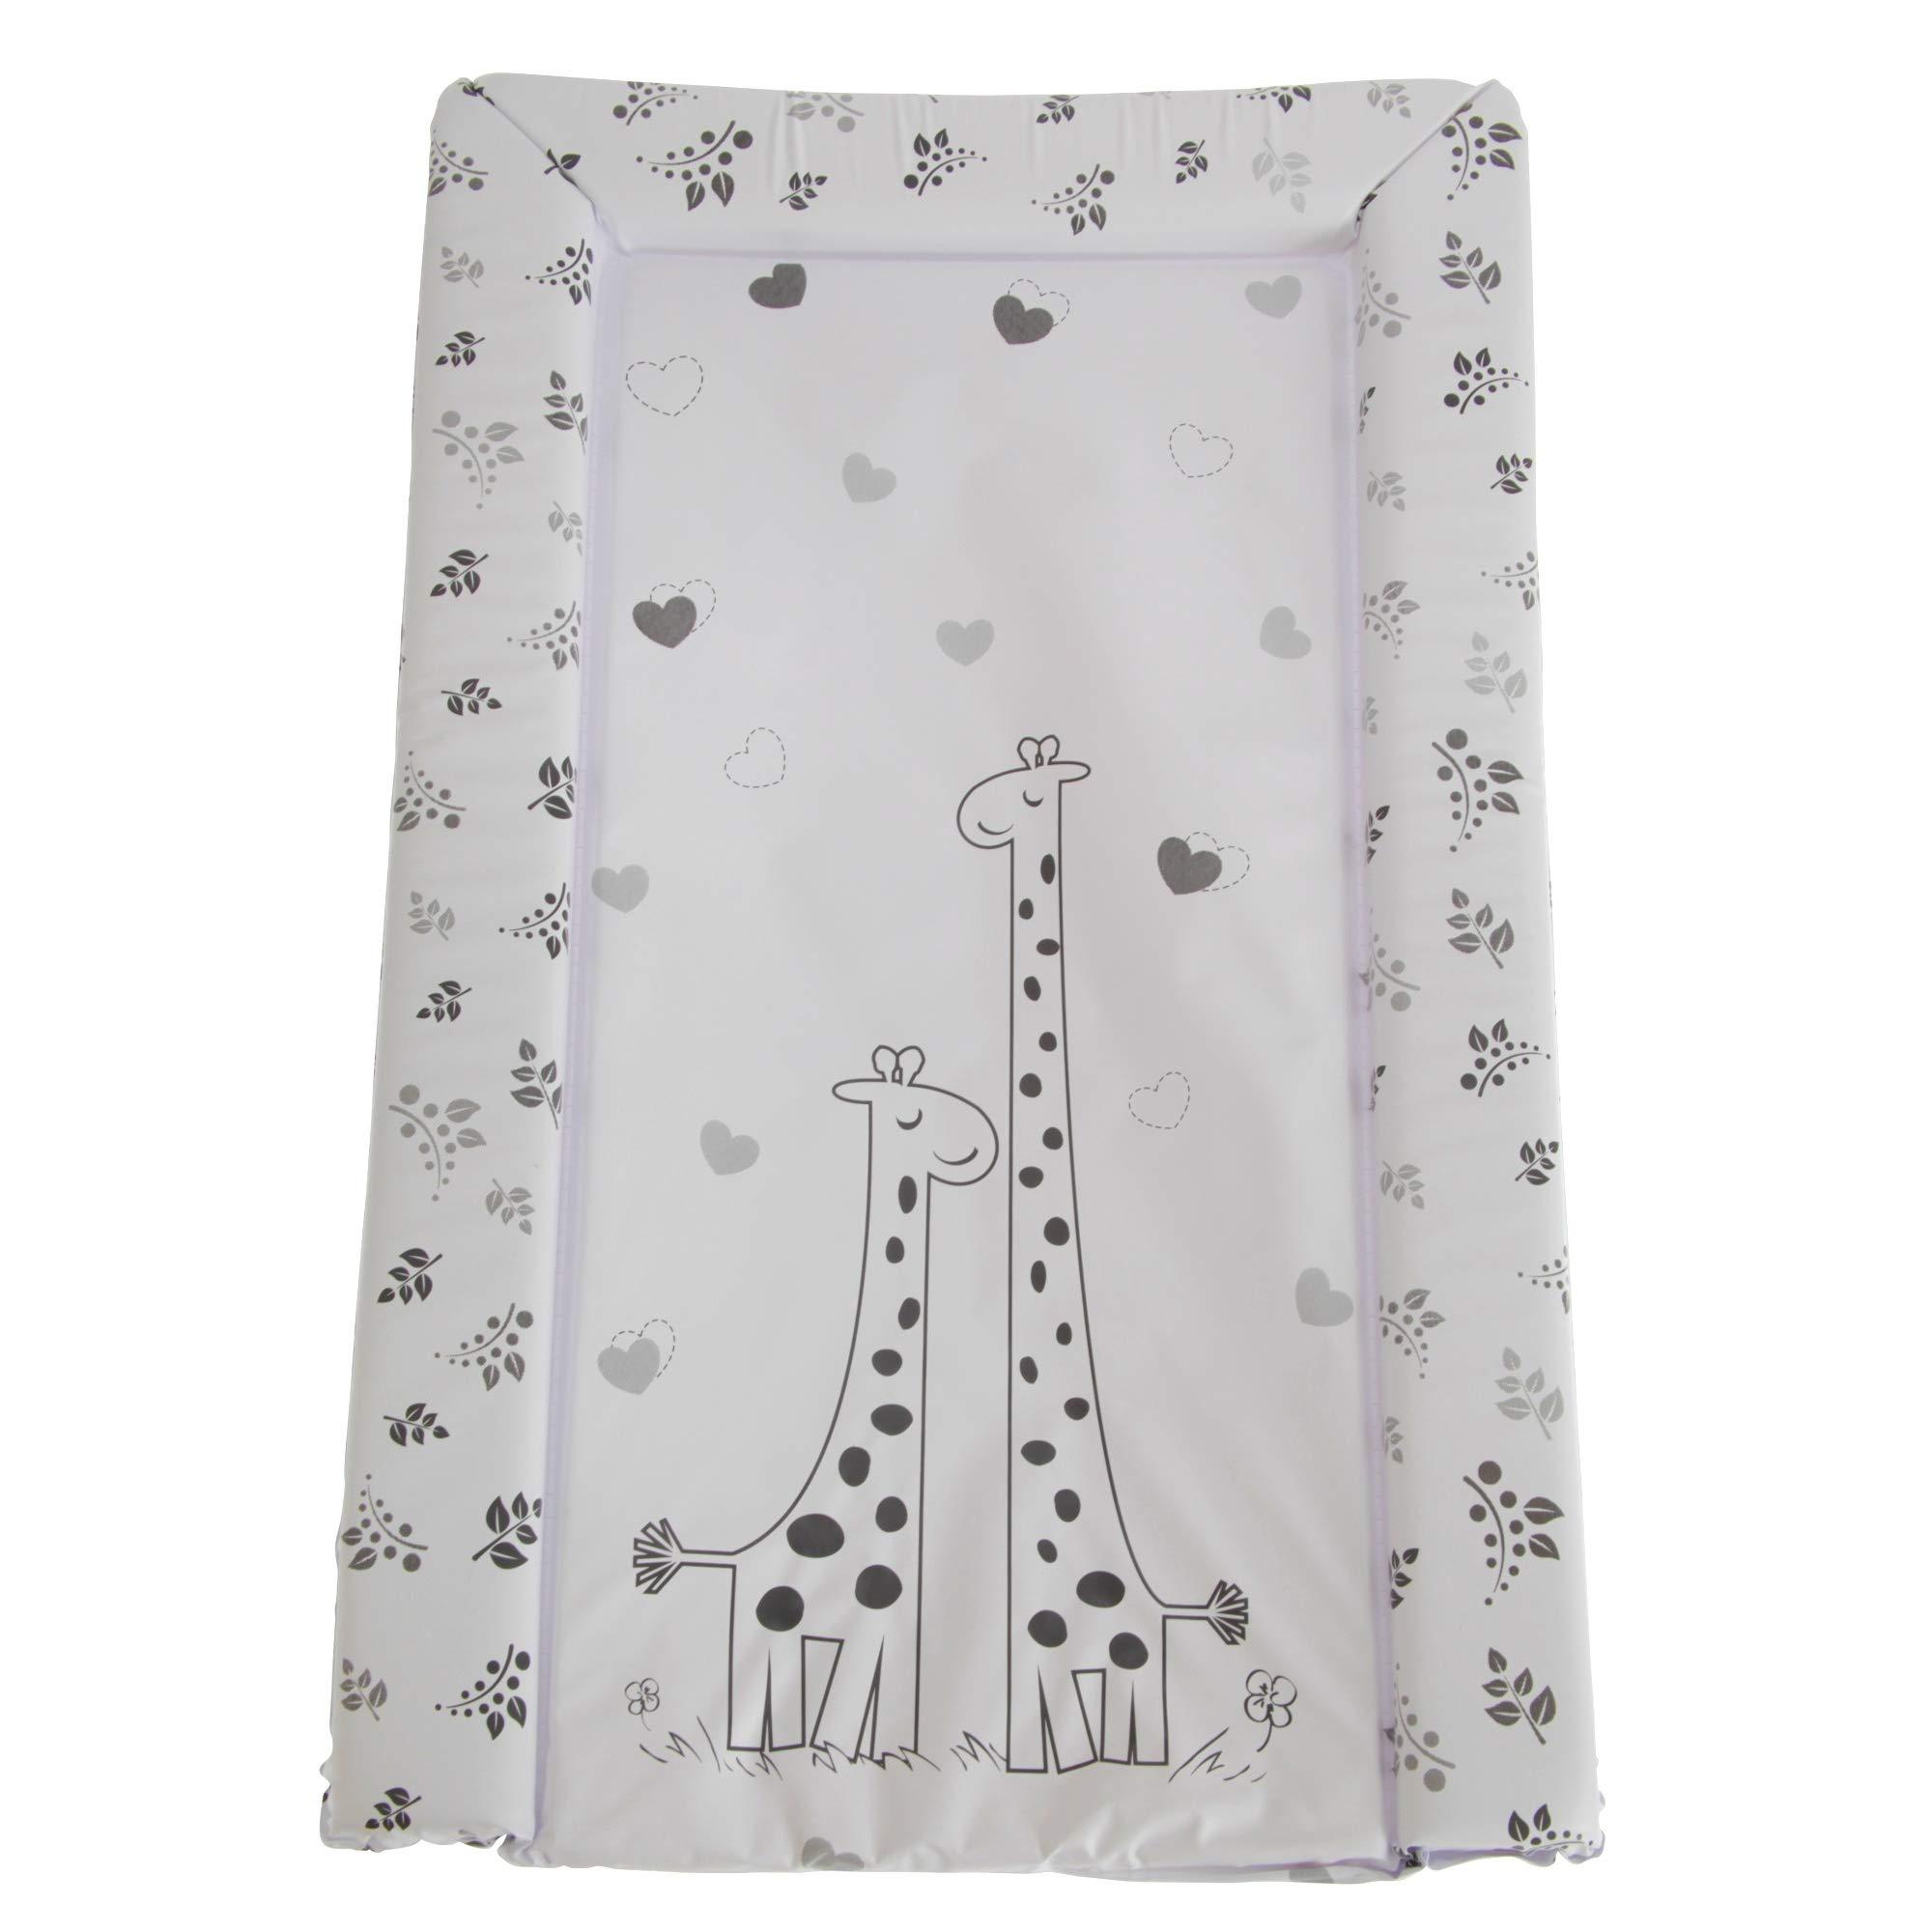 Snuggle Baby Giraffe Changing Mat (One Size) (Giraffe) by Snuggle Baby